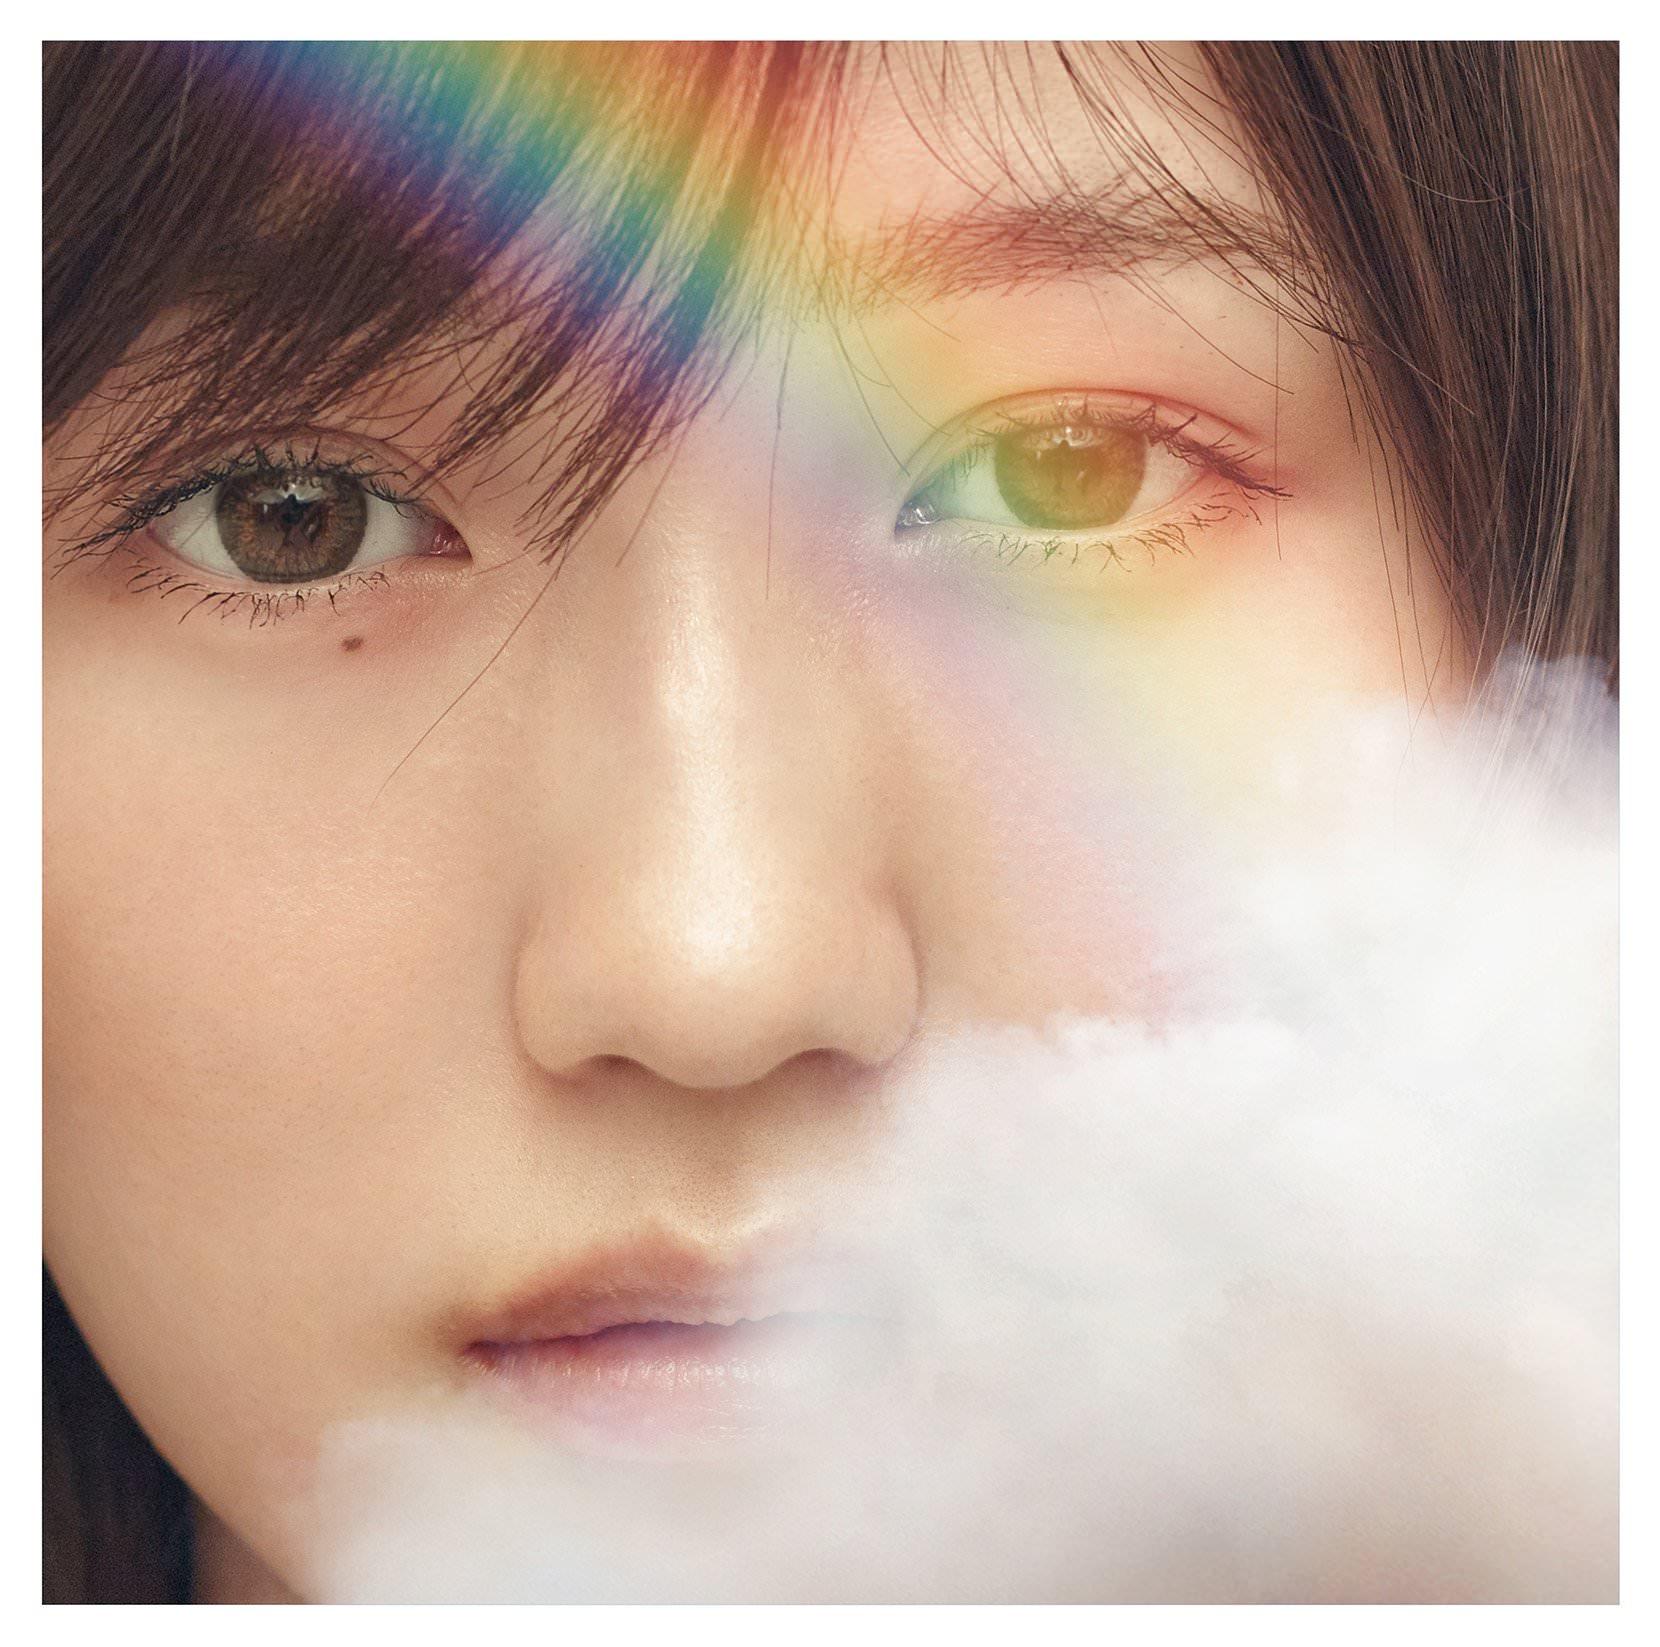 20180810.0048.04 AKB48 - 11gatsu no Anklet (Type A) (DVD) (JPOP.ru) cover 02.jpg